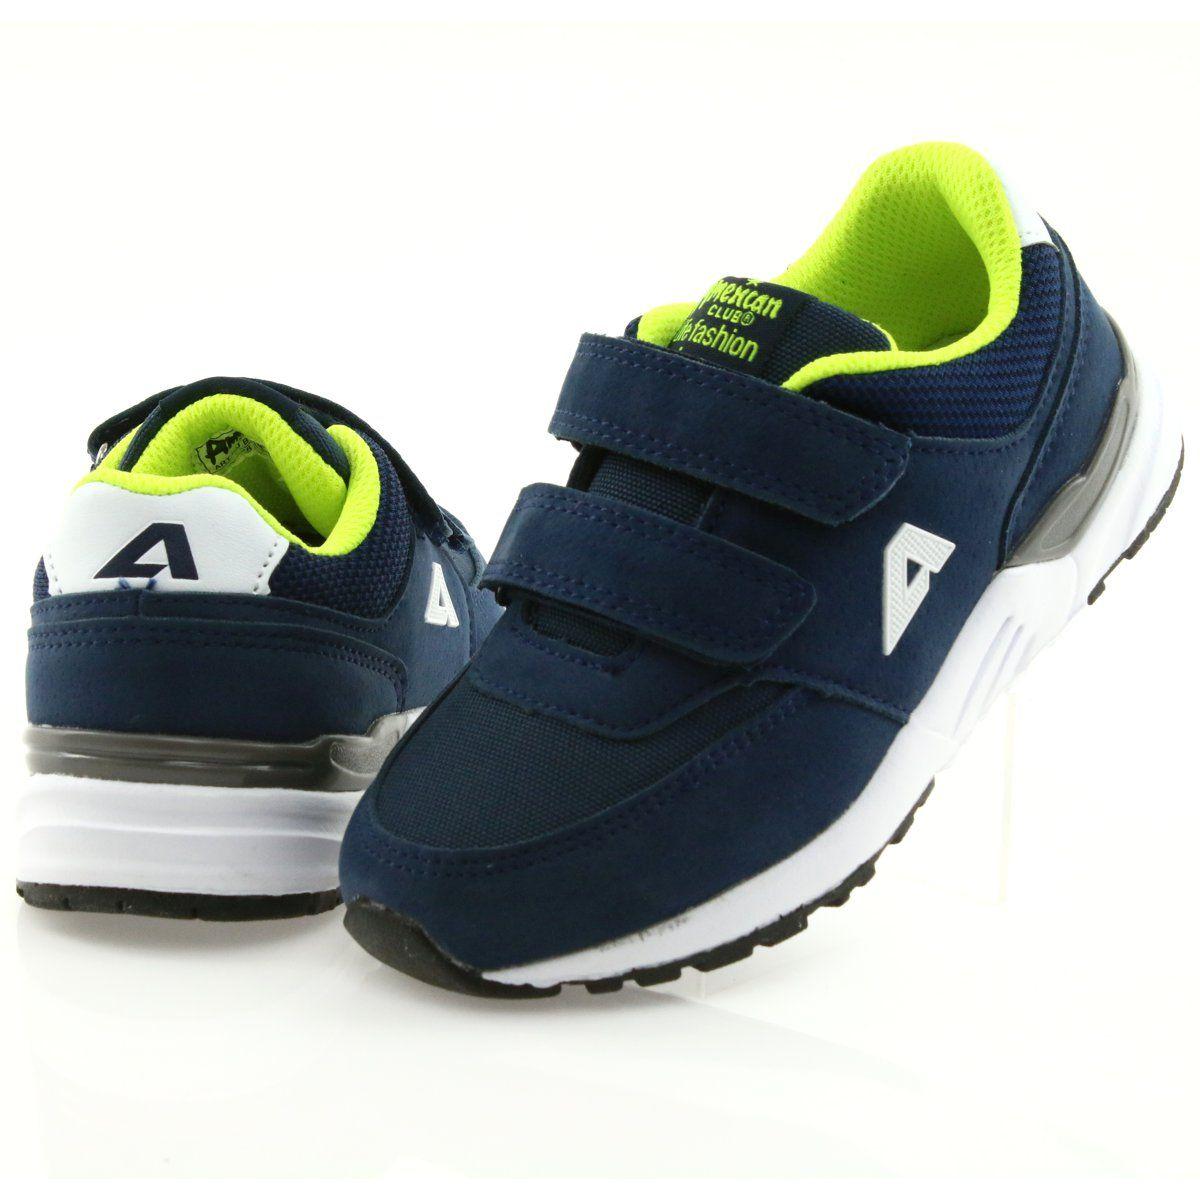 Buty Sportowe Wkladka Skorzana American Club Bs09 Granatowe Sport Shoes Kid Shoes Shoes